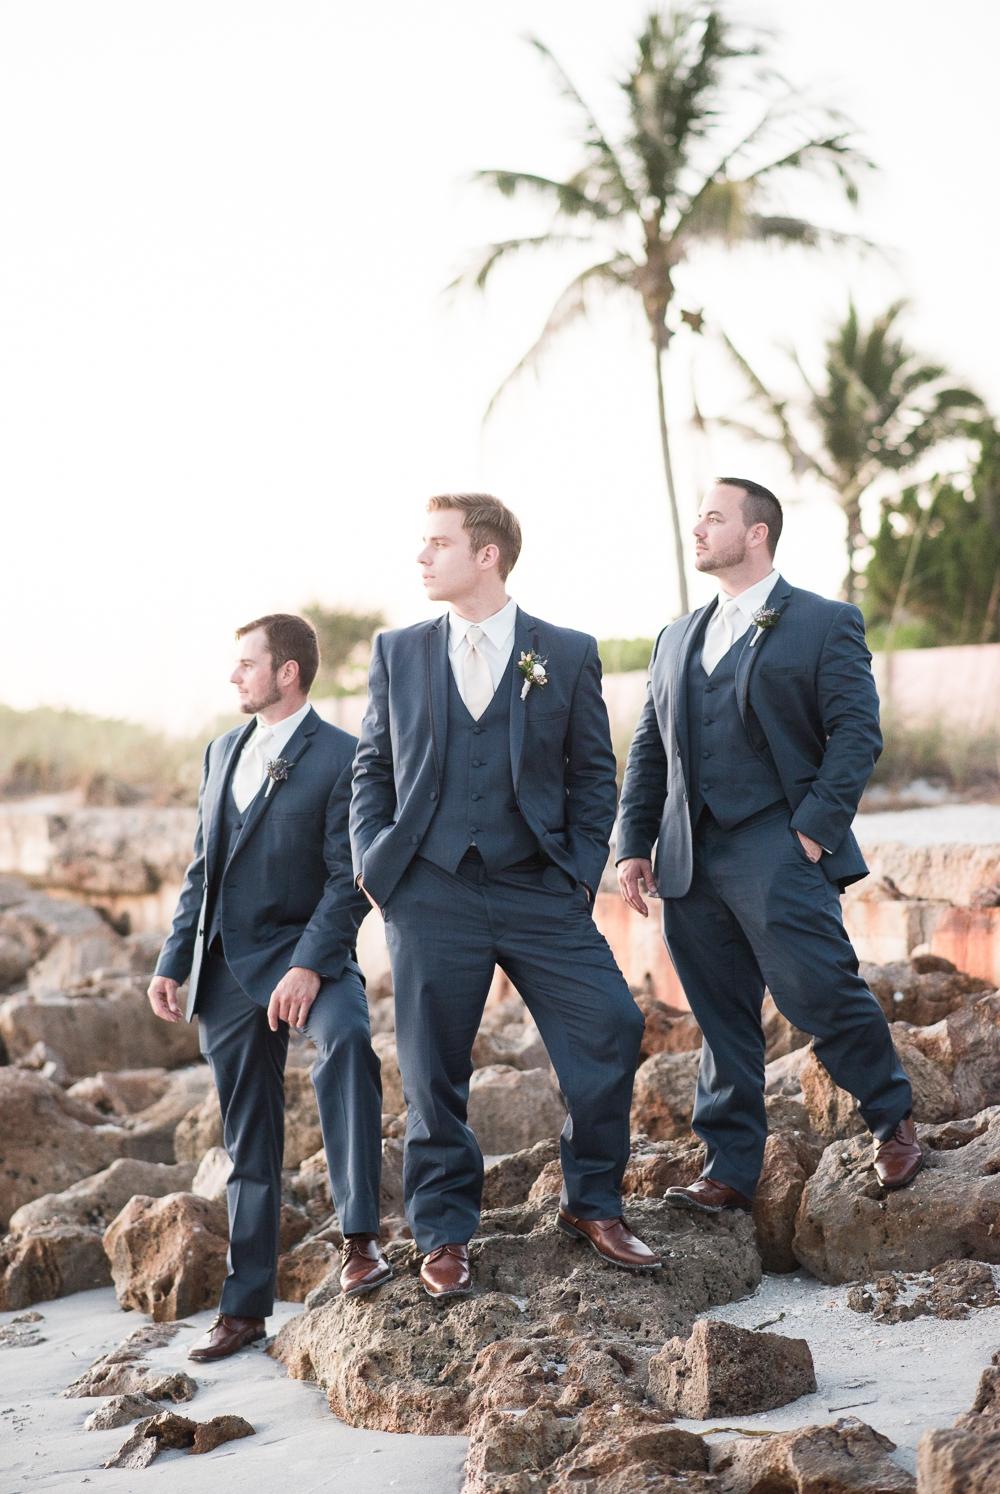 2016 HLM Wedding Beach Shoot 11.jpg